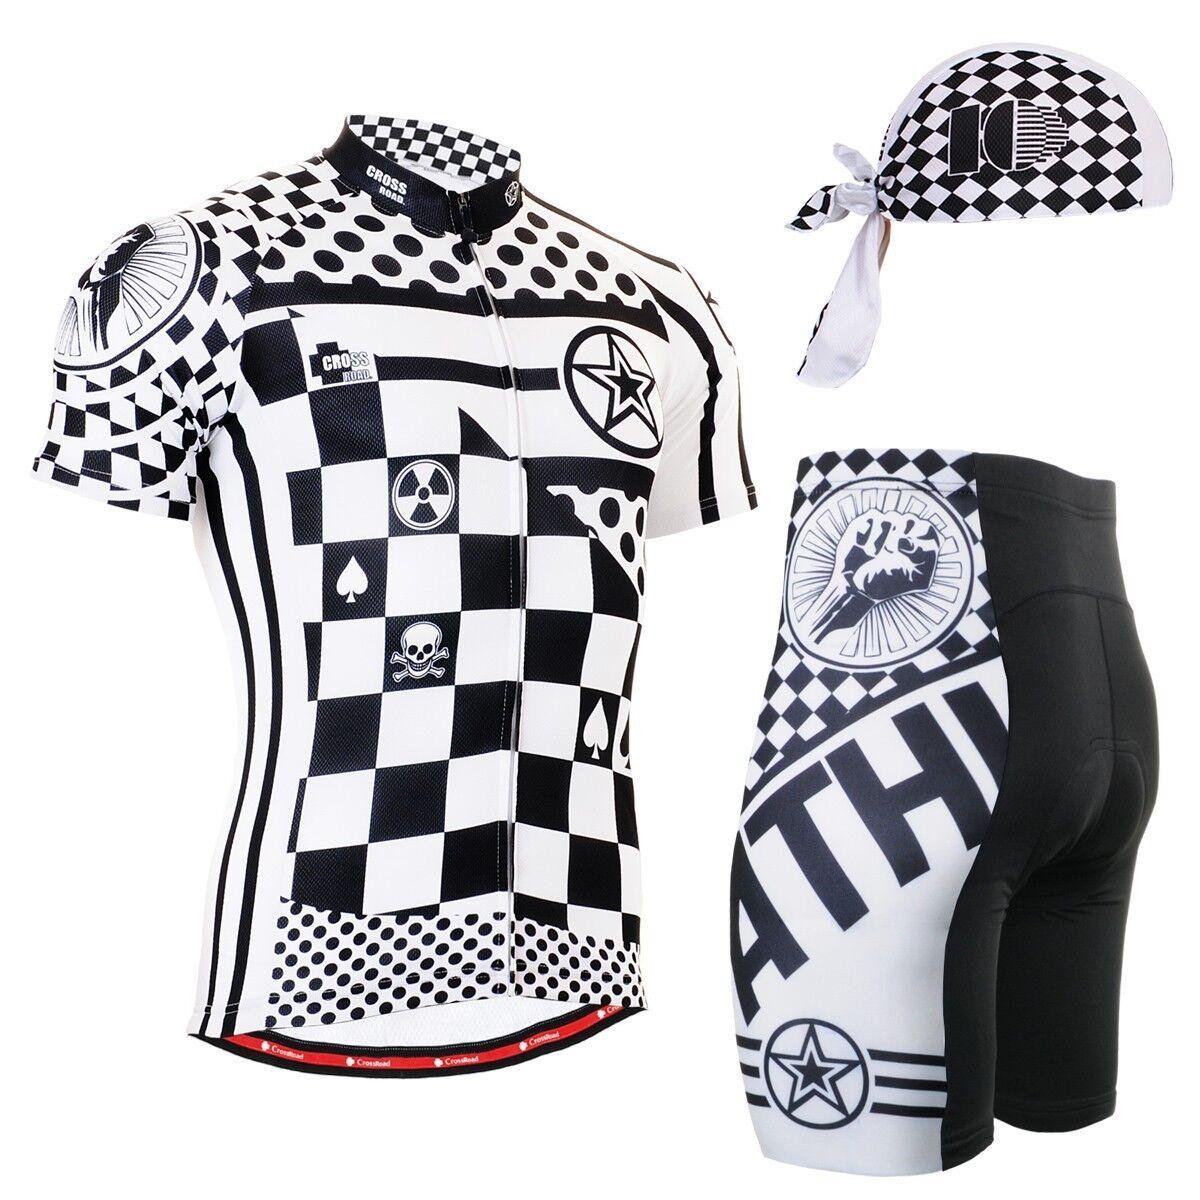 FIXGEAR CS-602-SET Cycling Jersey & Shorts Padded, Bicycle Wear, MTB Road Bike